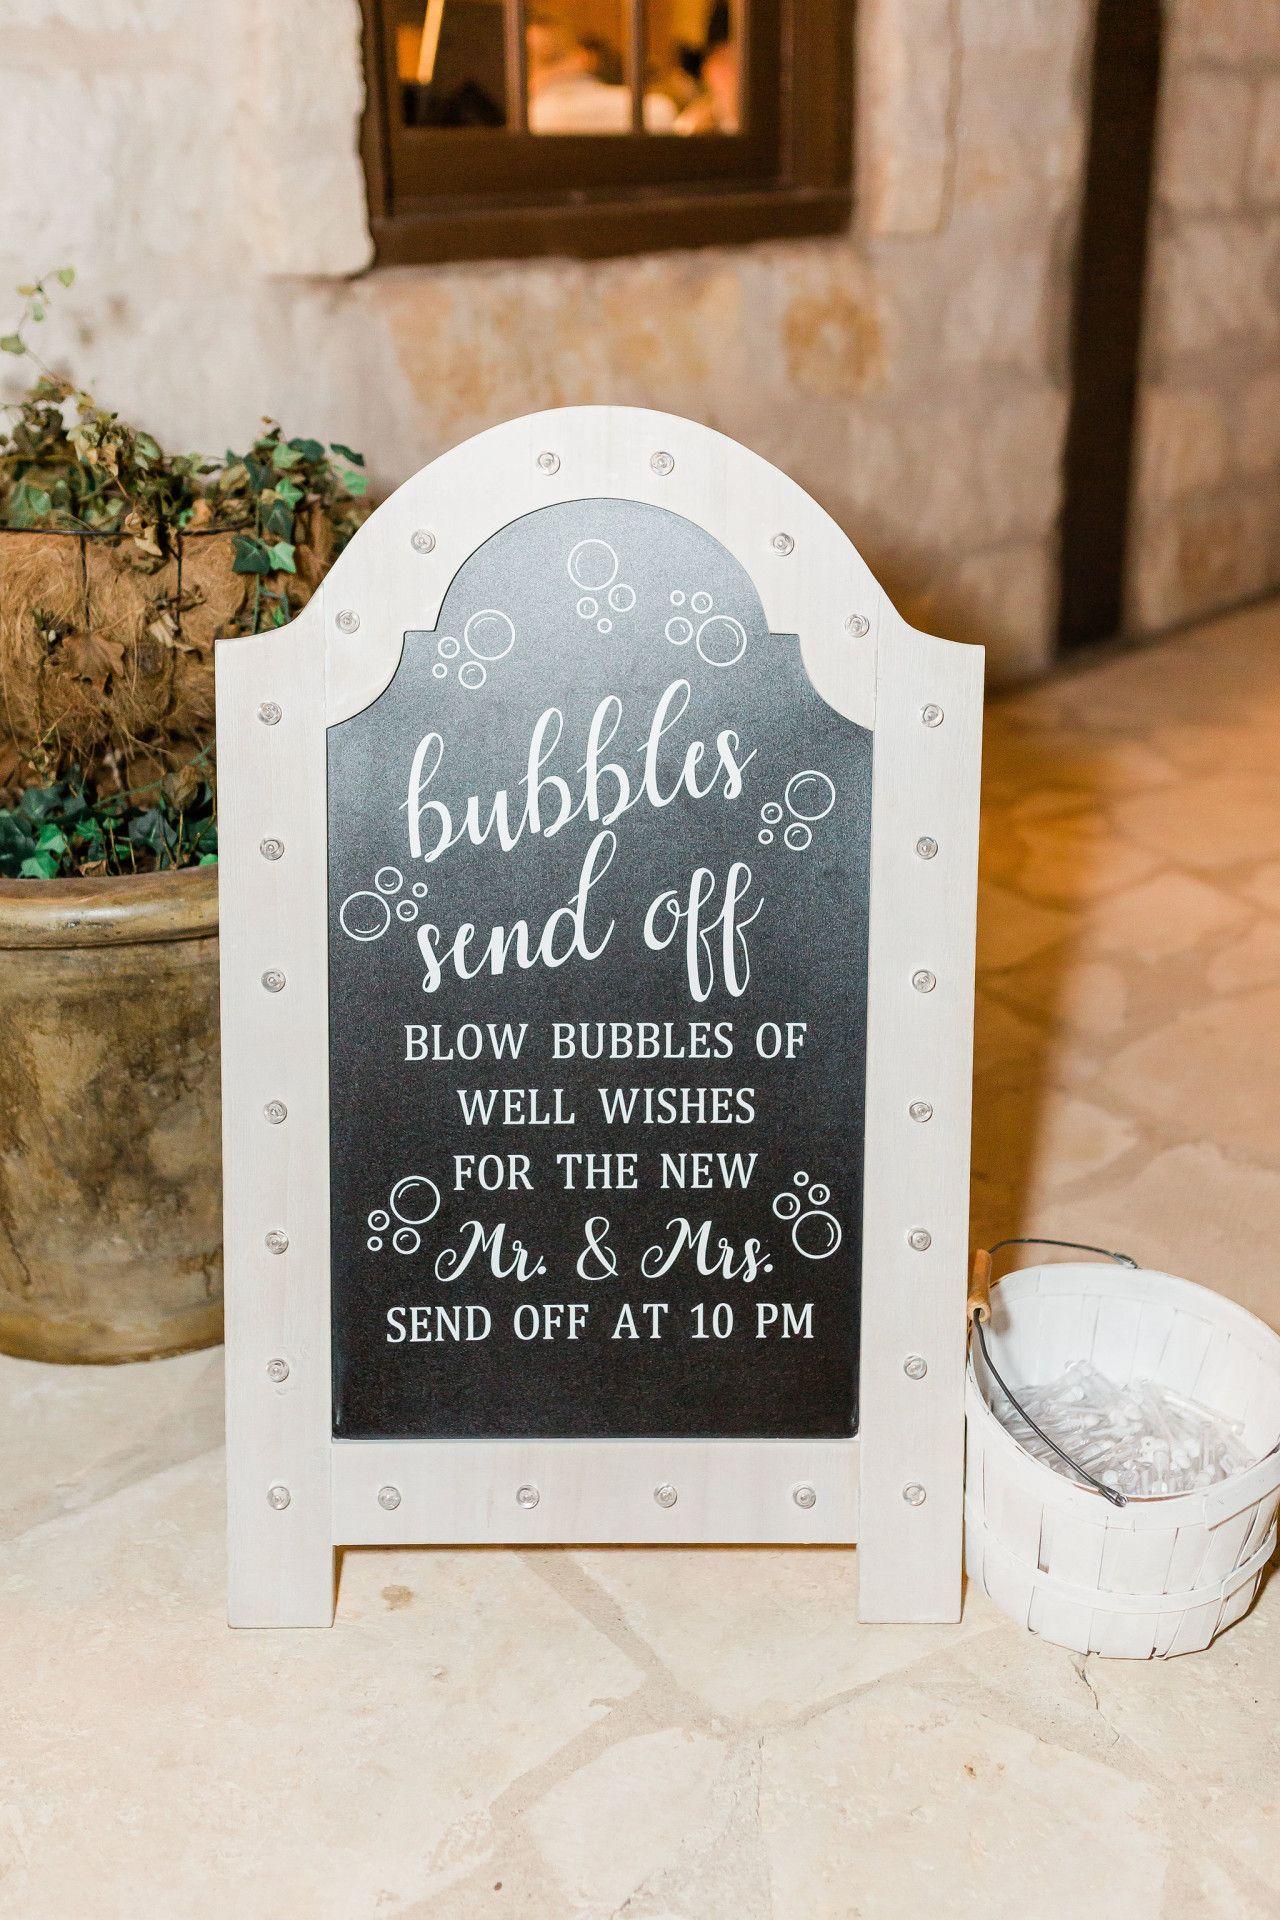 Boho Chic Wedding Signs Bubble Wedding Send Off Sign Ideas Modern Rustic Wedding Sign Ideas Bubb Wedding Bubbles Sign Wedding Bubbles Wedding Send Off